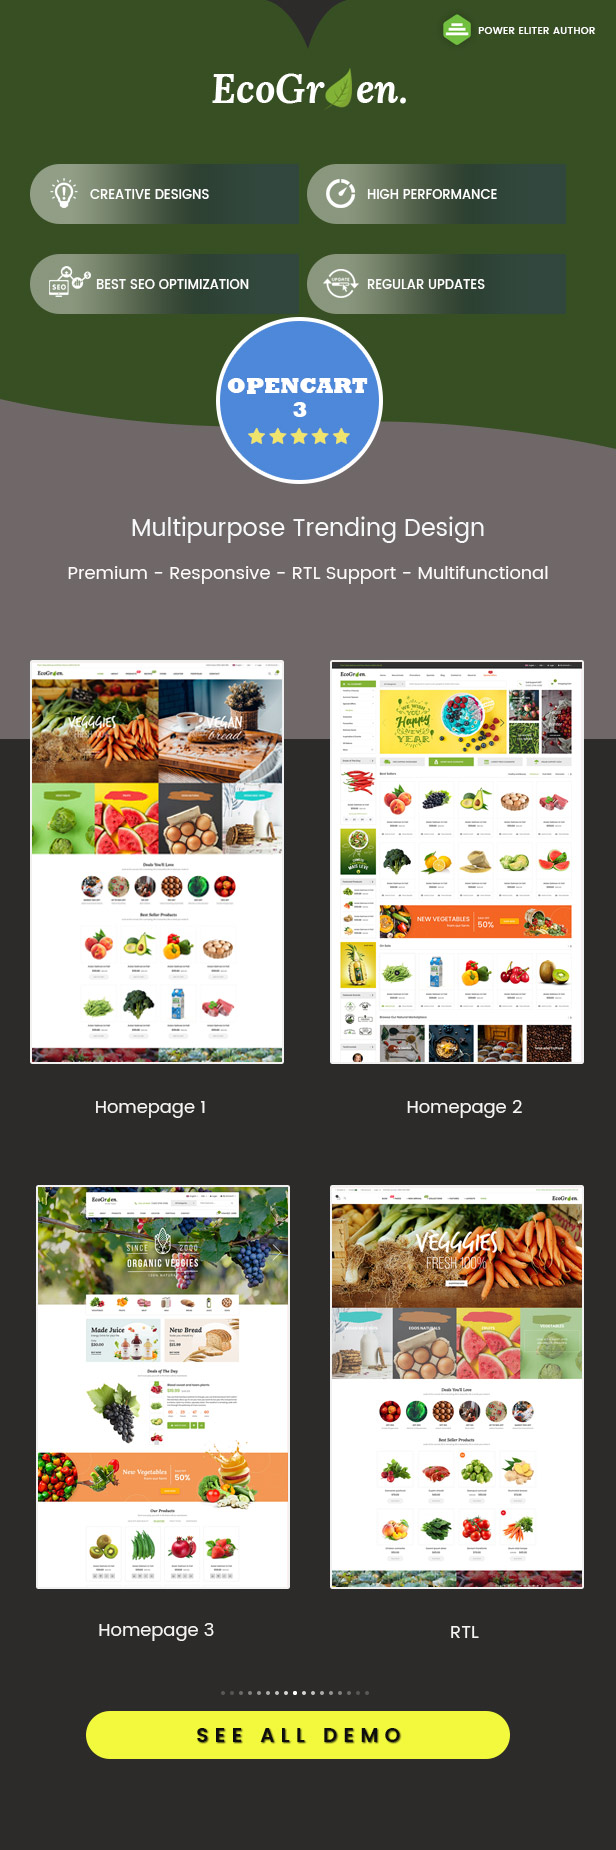 ecogreen - Opencart Theme